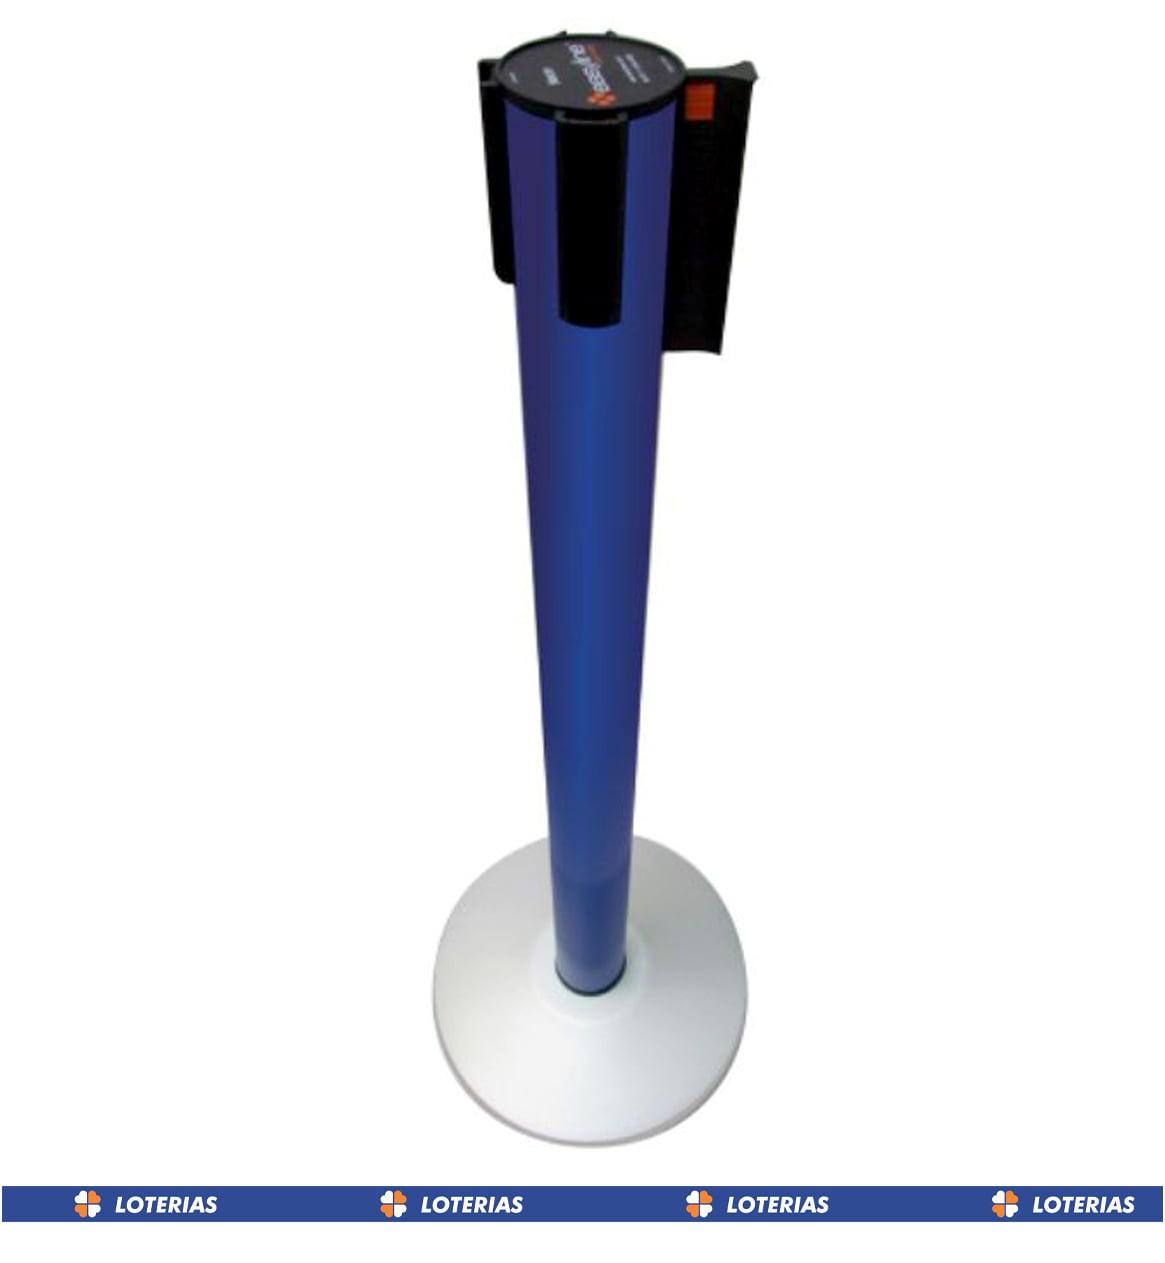 * Pedestal Organizador, Demarcador, Divisor Modelo Neon Alumínio Padrão Lotérica (cx. 3 unid.)